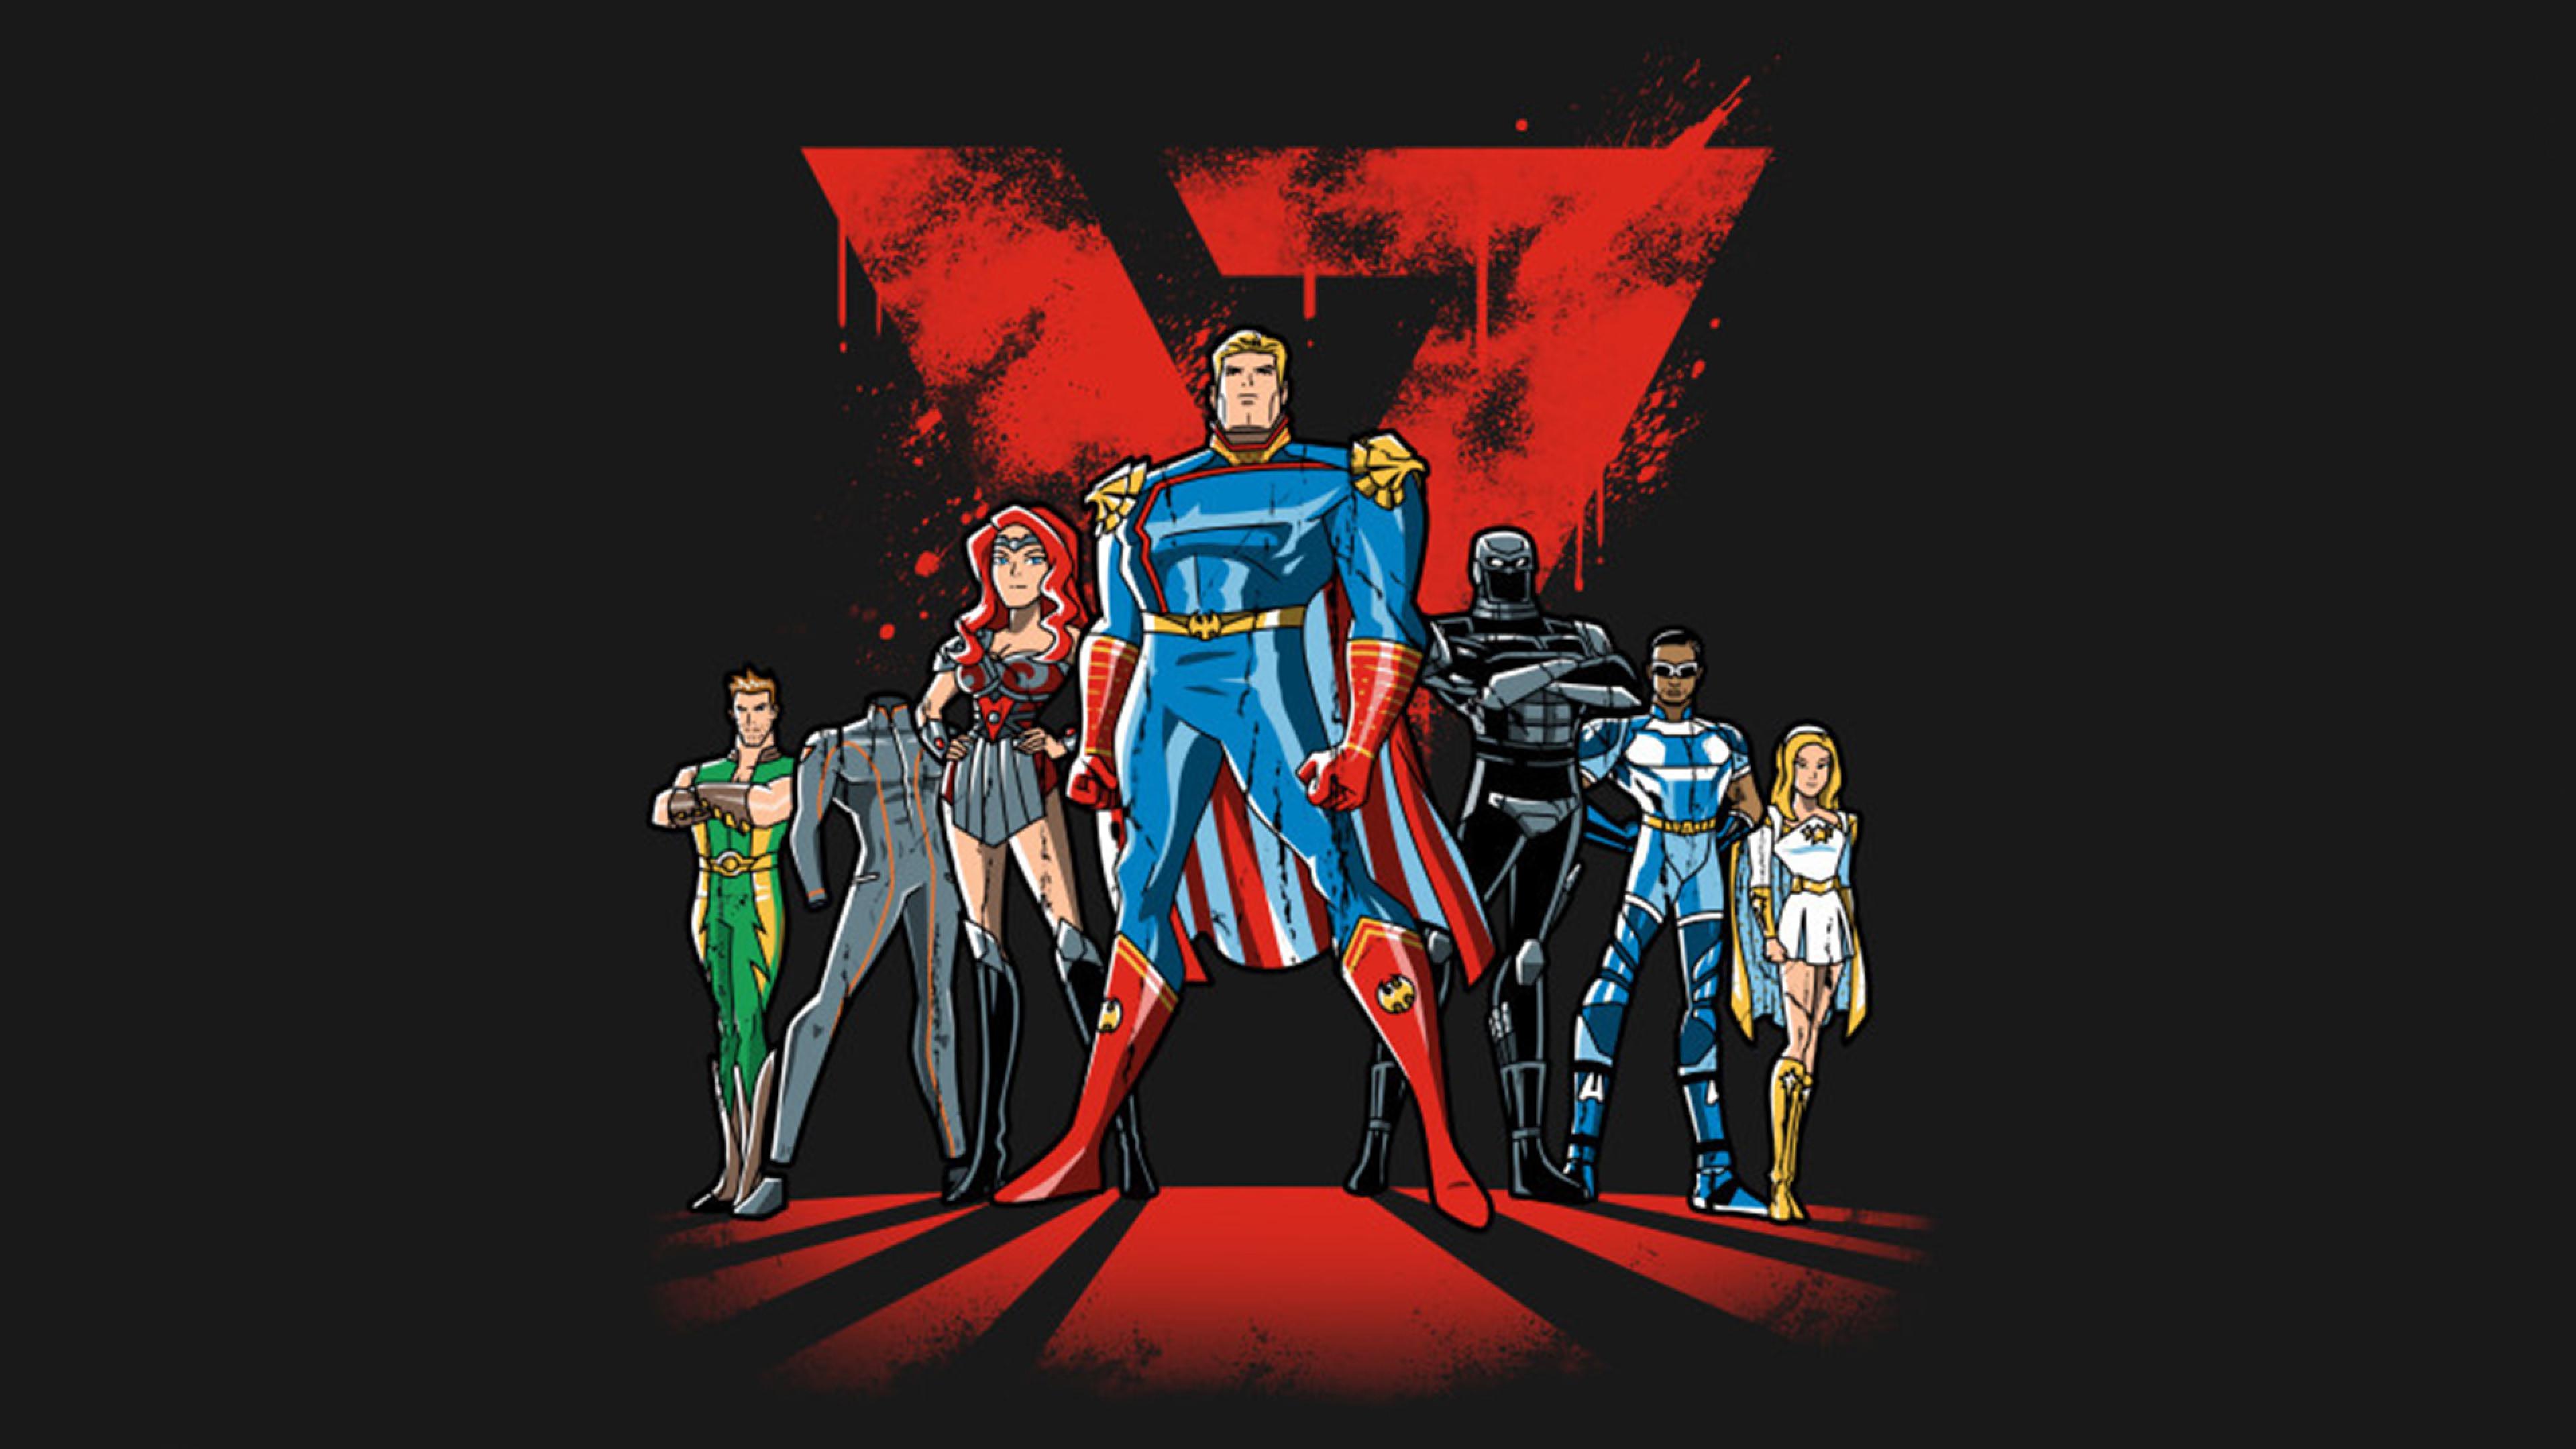 3840x2160 The Boys Superheroes 4K Wallpaper, HD ...